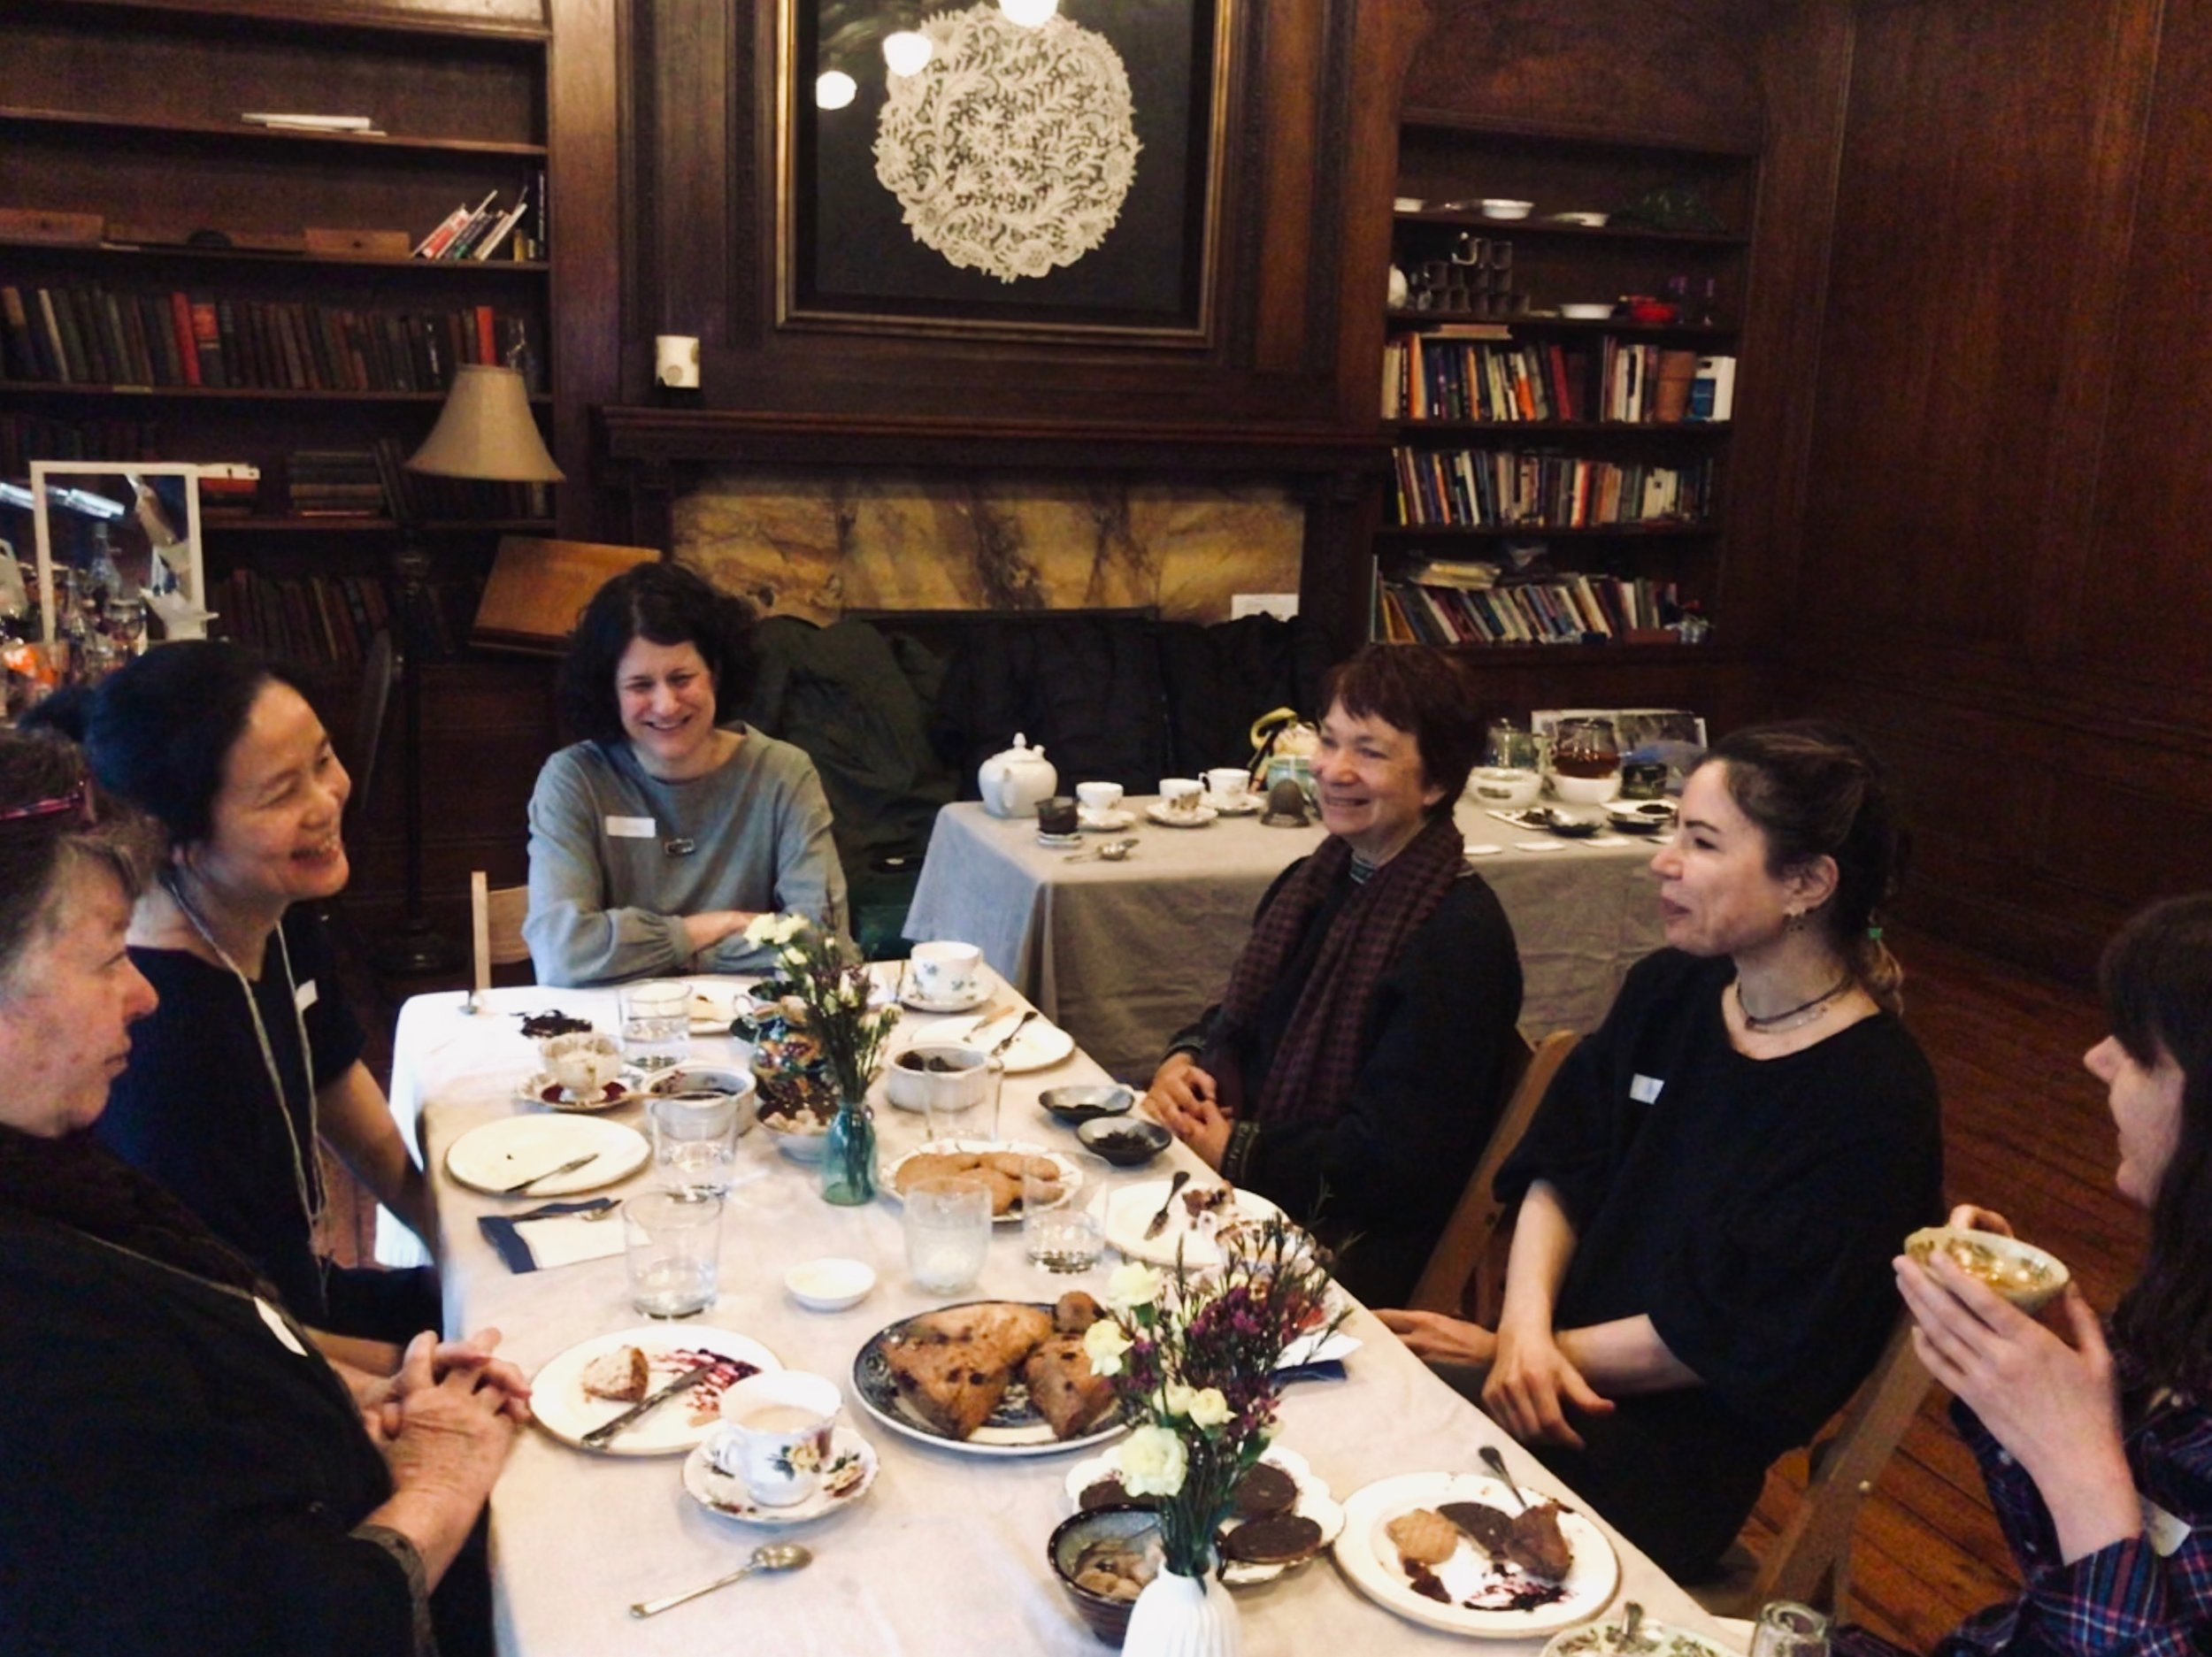 TeaXchange Mar 2019: English Tea History and Tradition